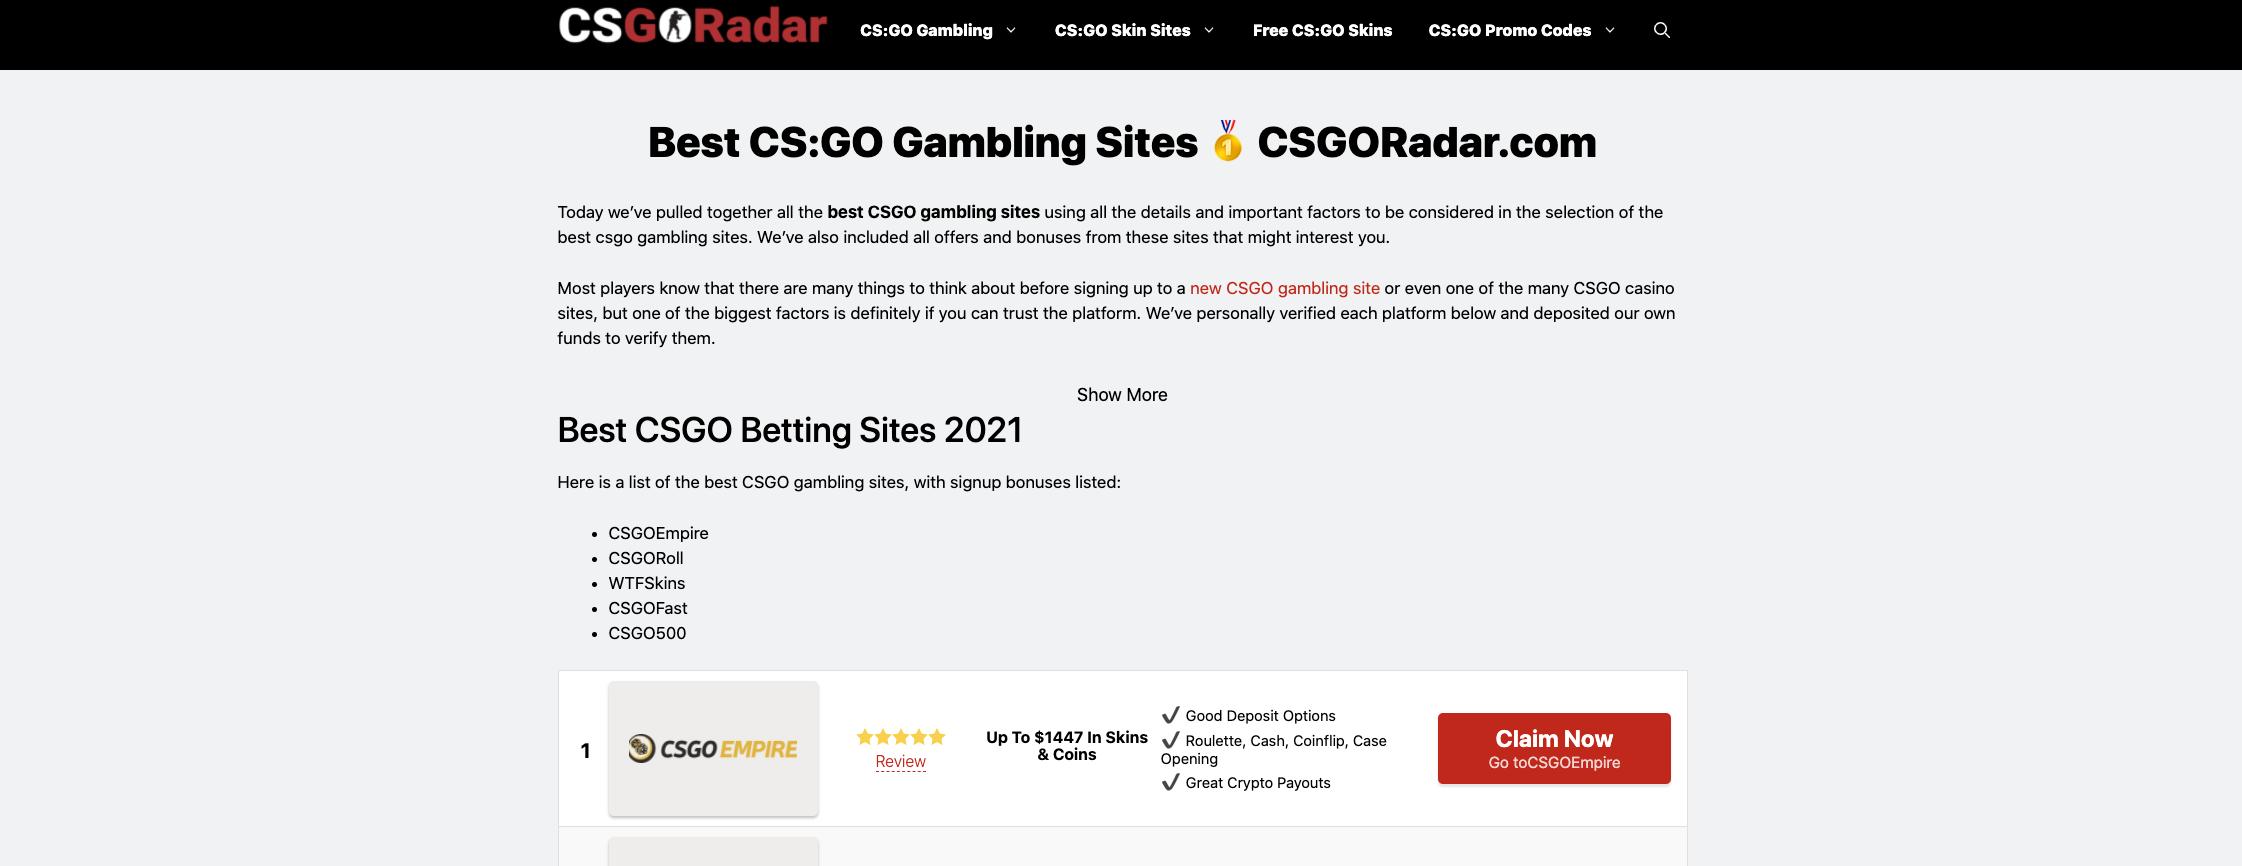 Finding CSGO Gambling Sites with CSGORadar